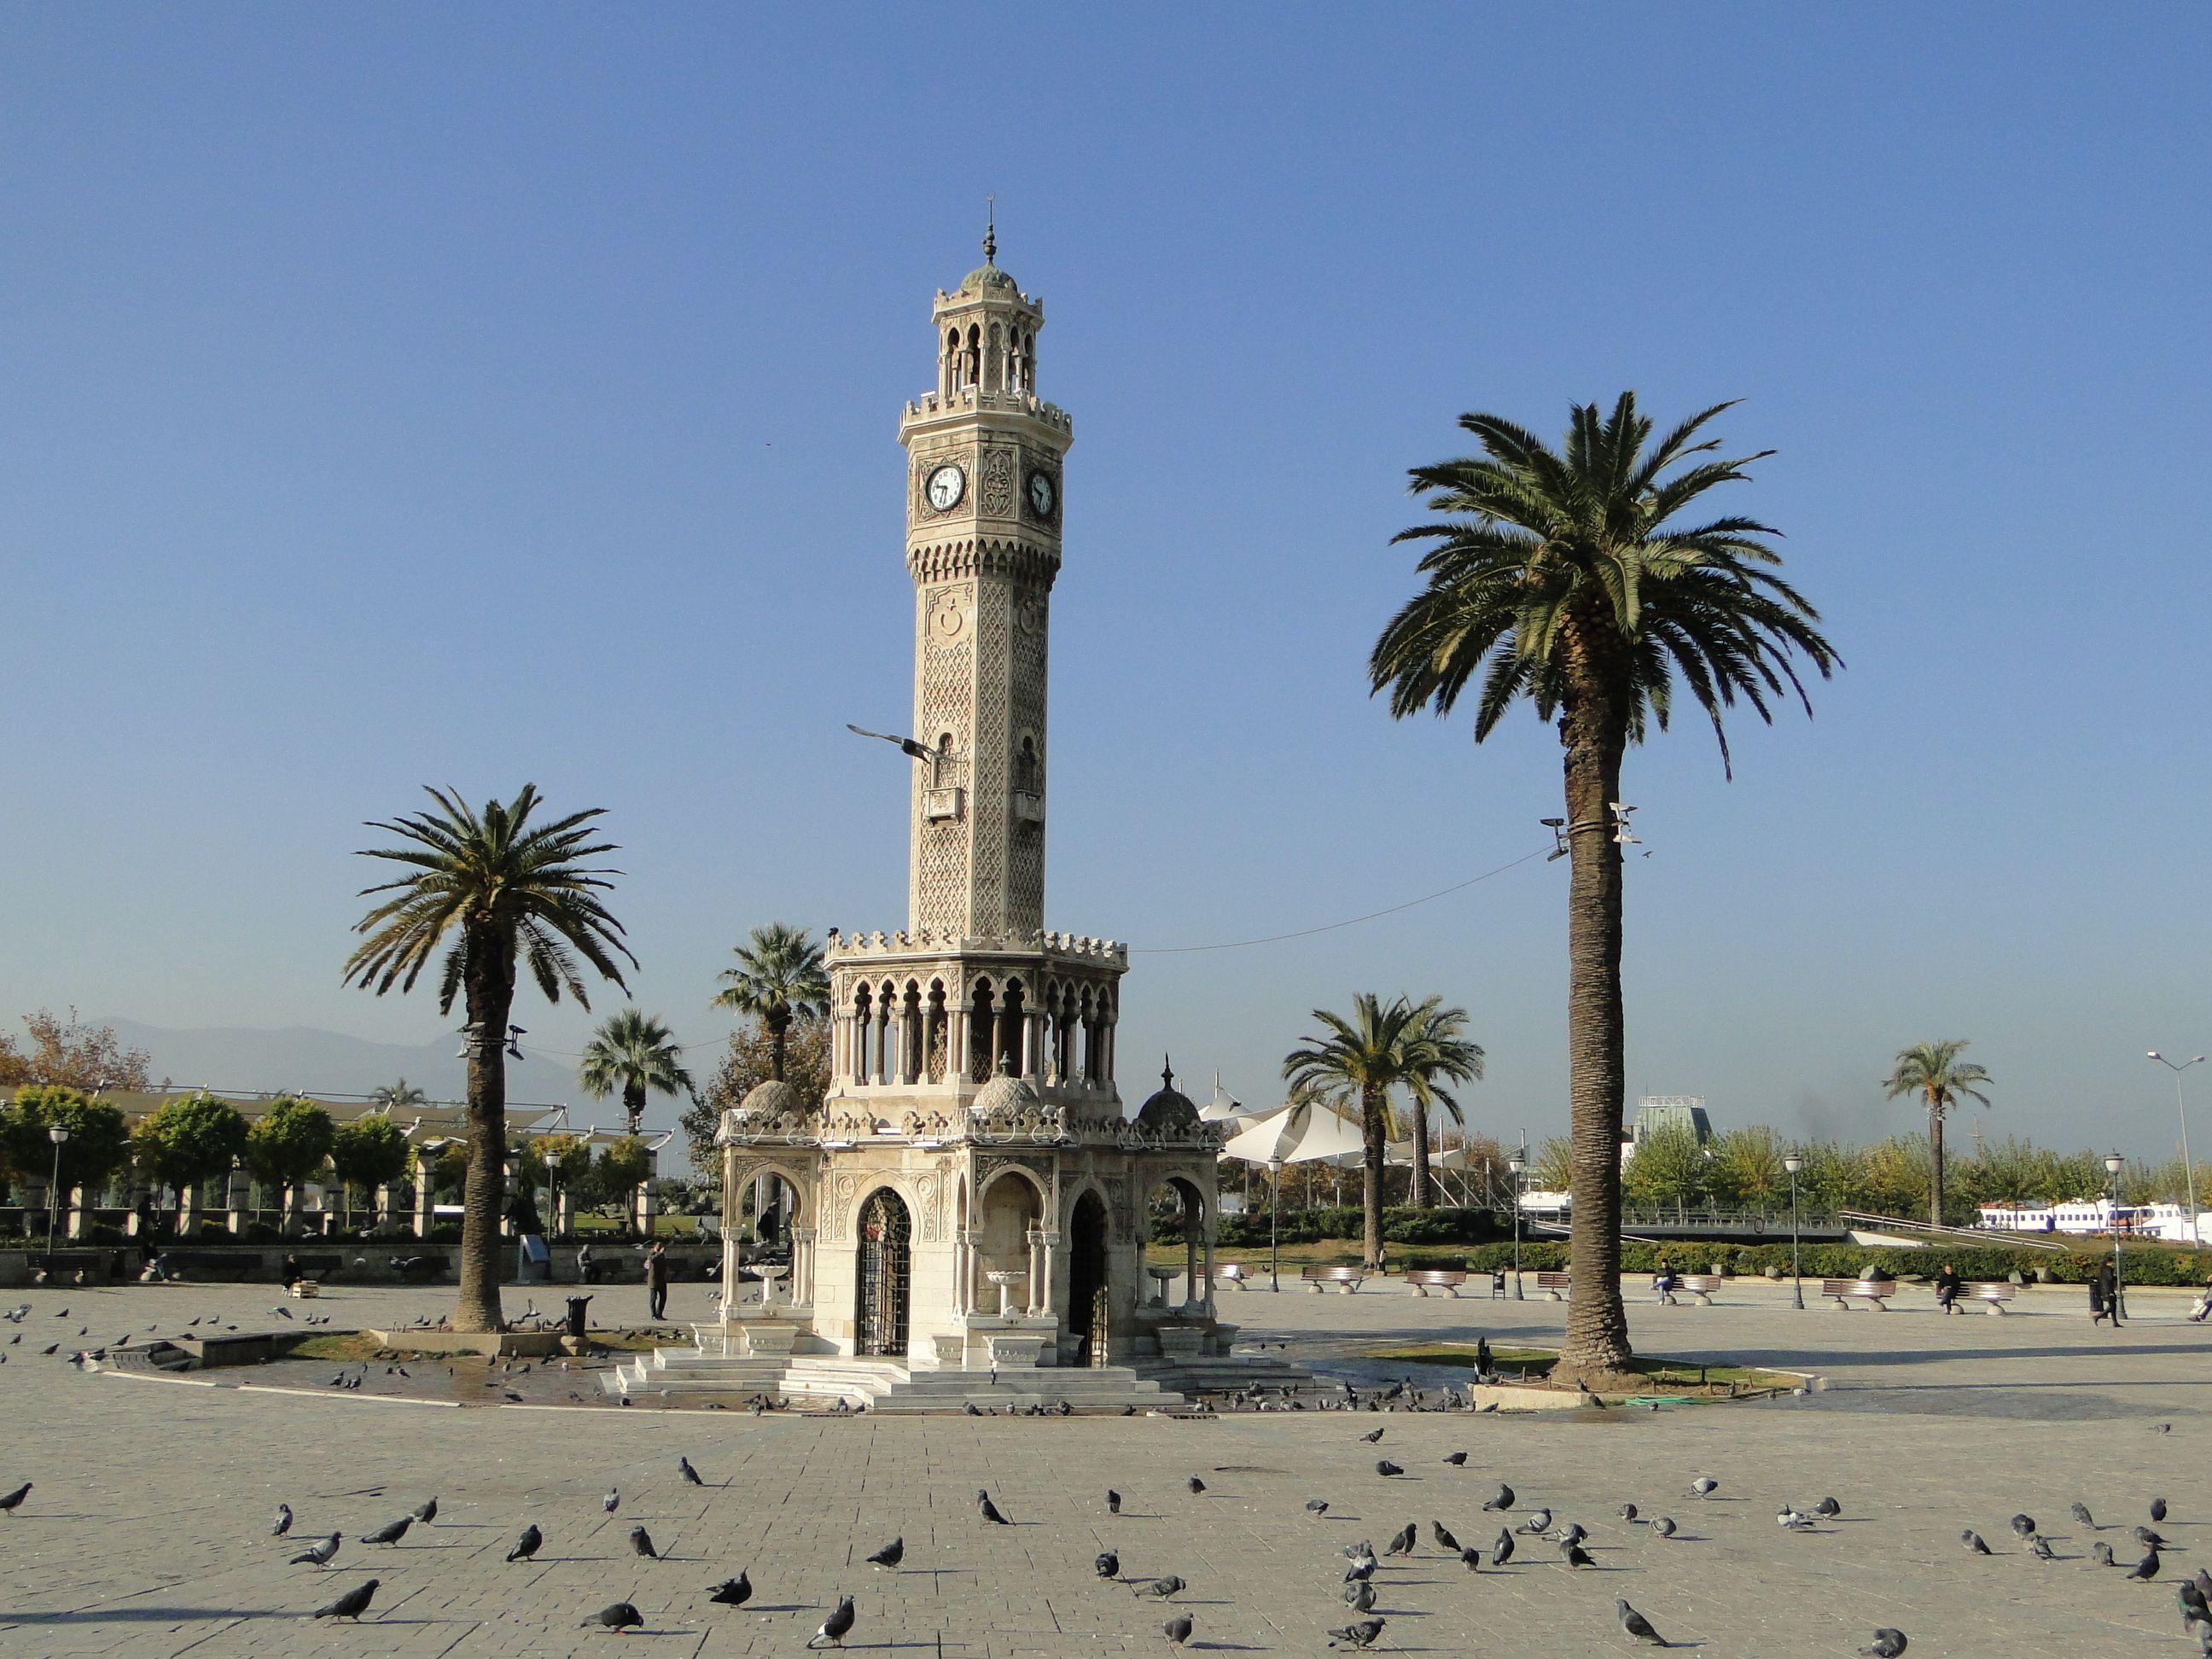 Book your tickets online for Saat Kulesi (Clock Tower), Izmir: See 1,020